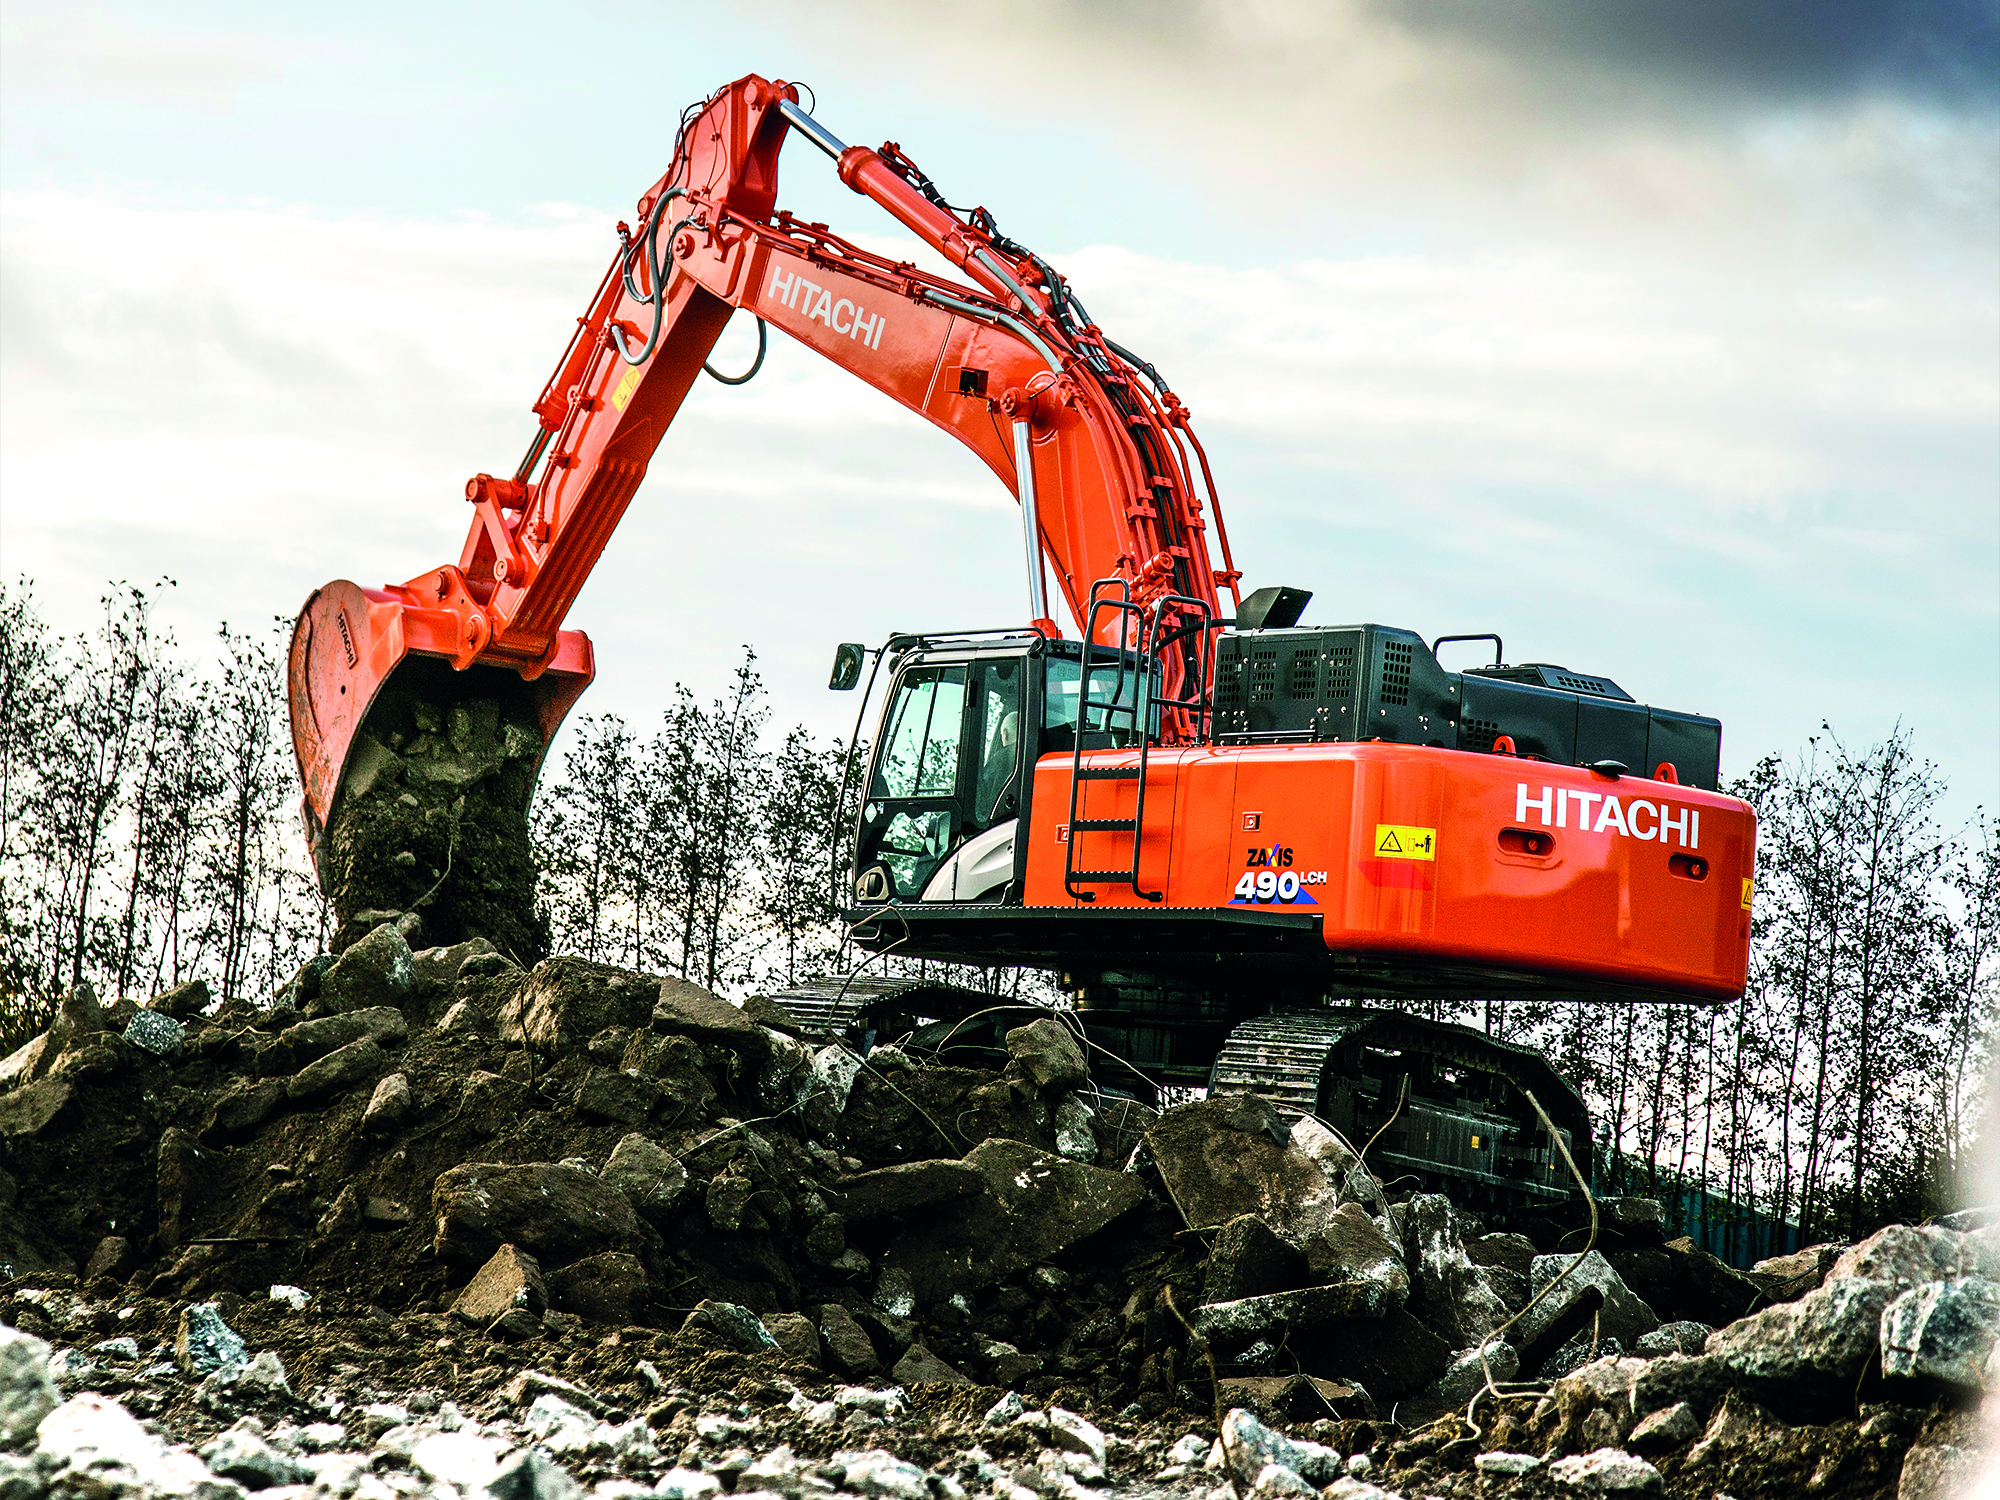 Hitachi Zx490lch 6 To Be Unveiled At Bauma 2016 Hitachi